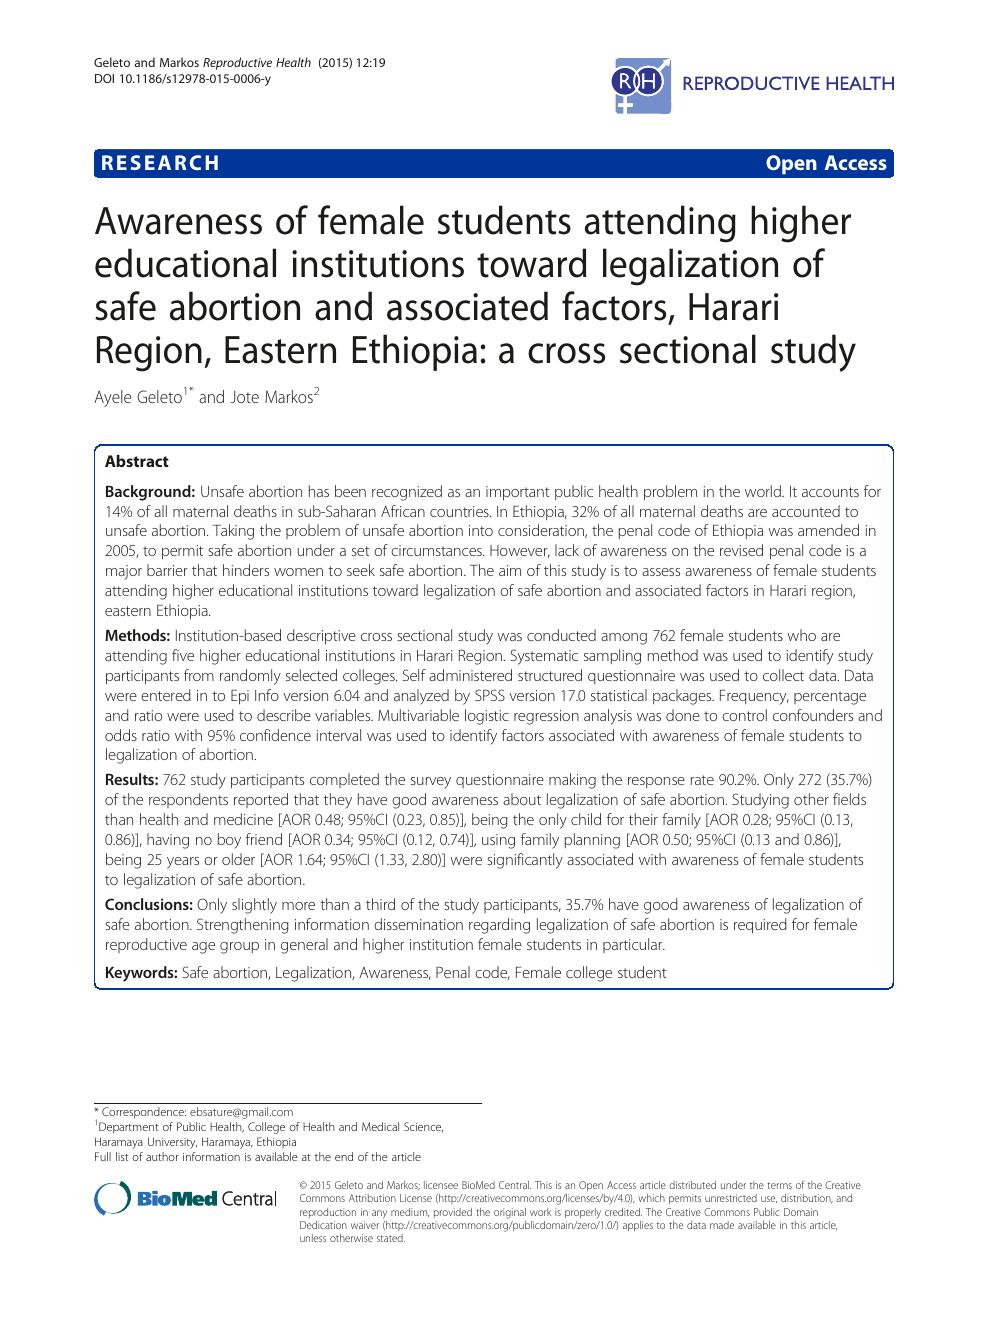 Awareness of female students attending higher educational